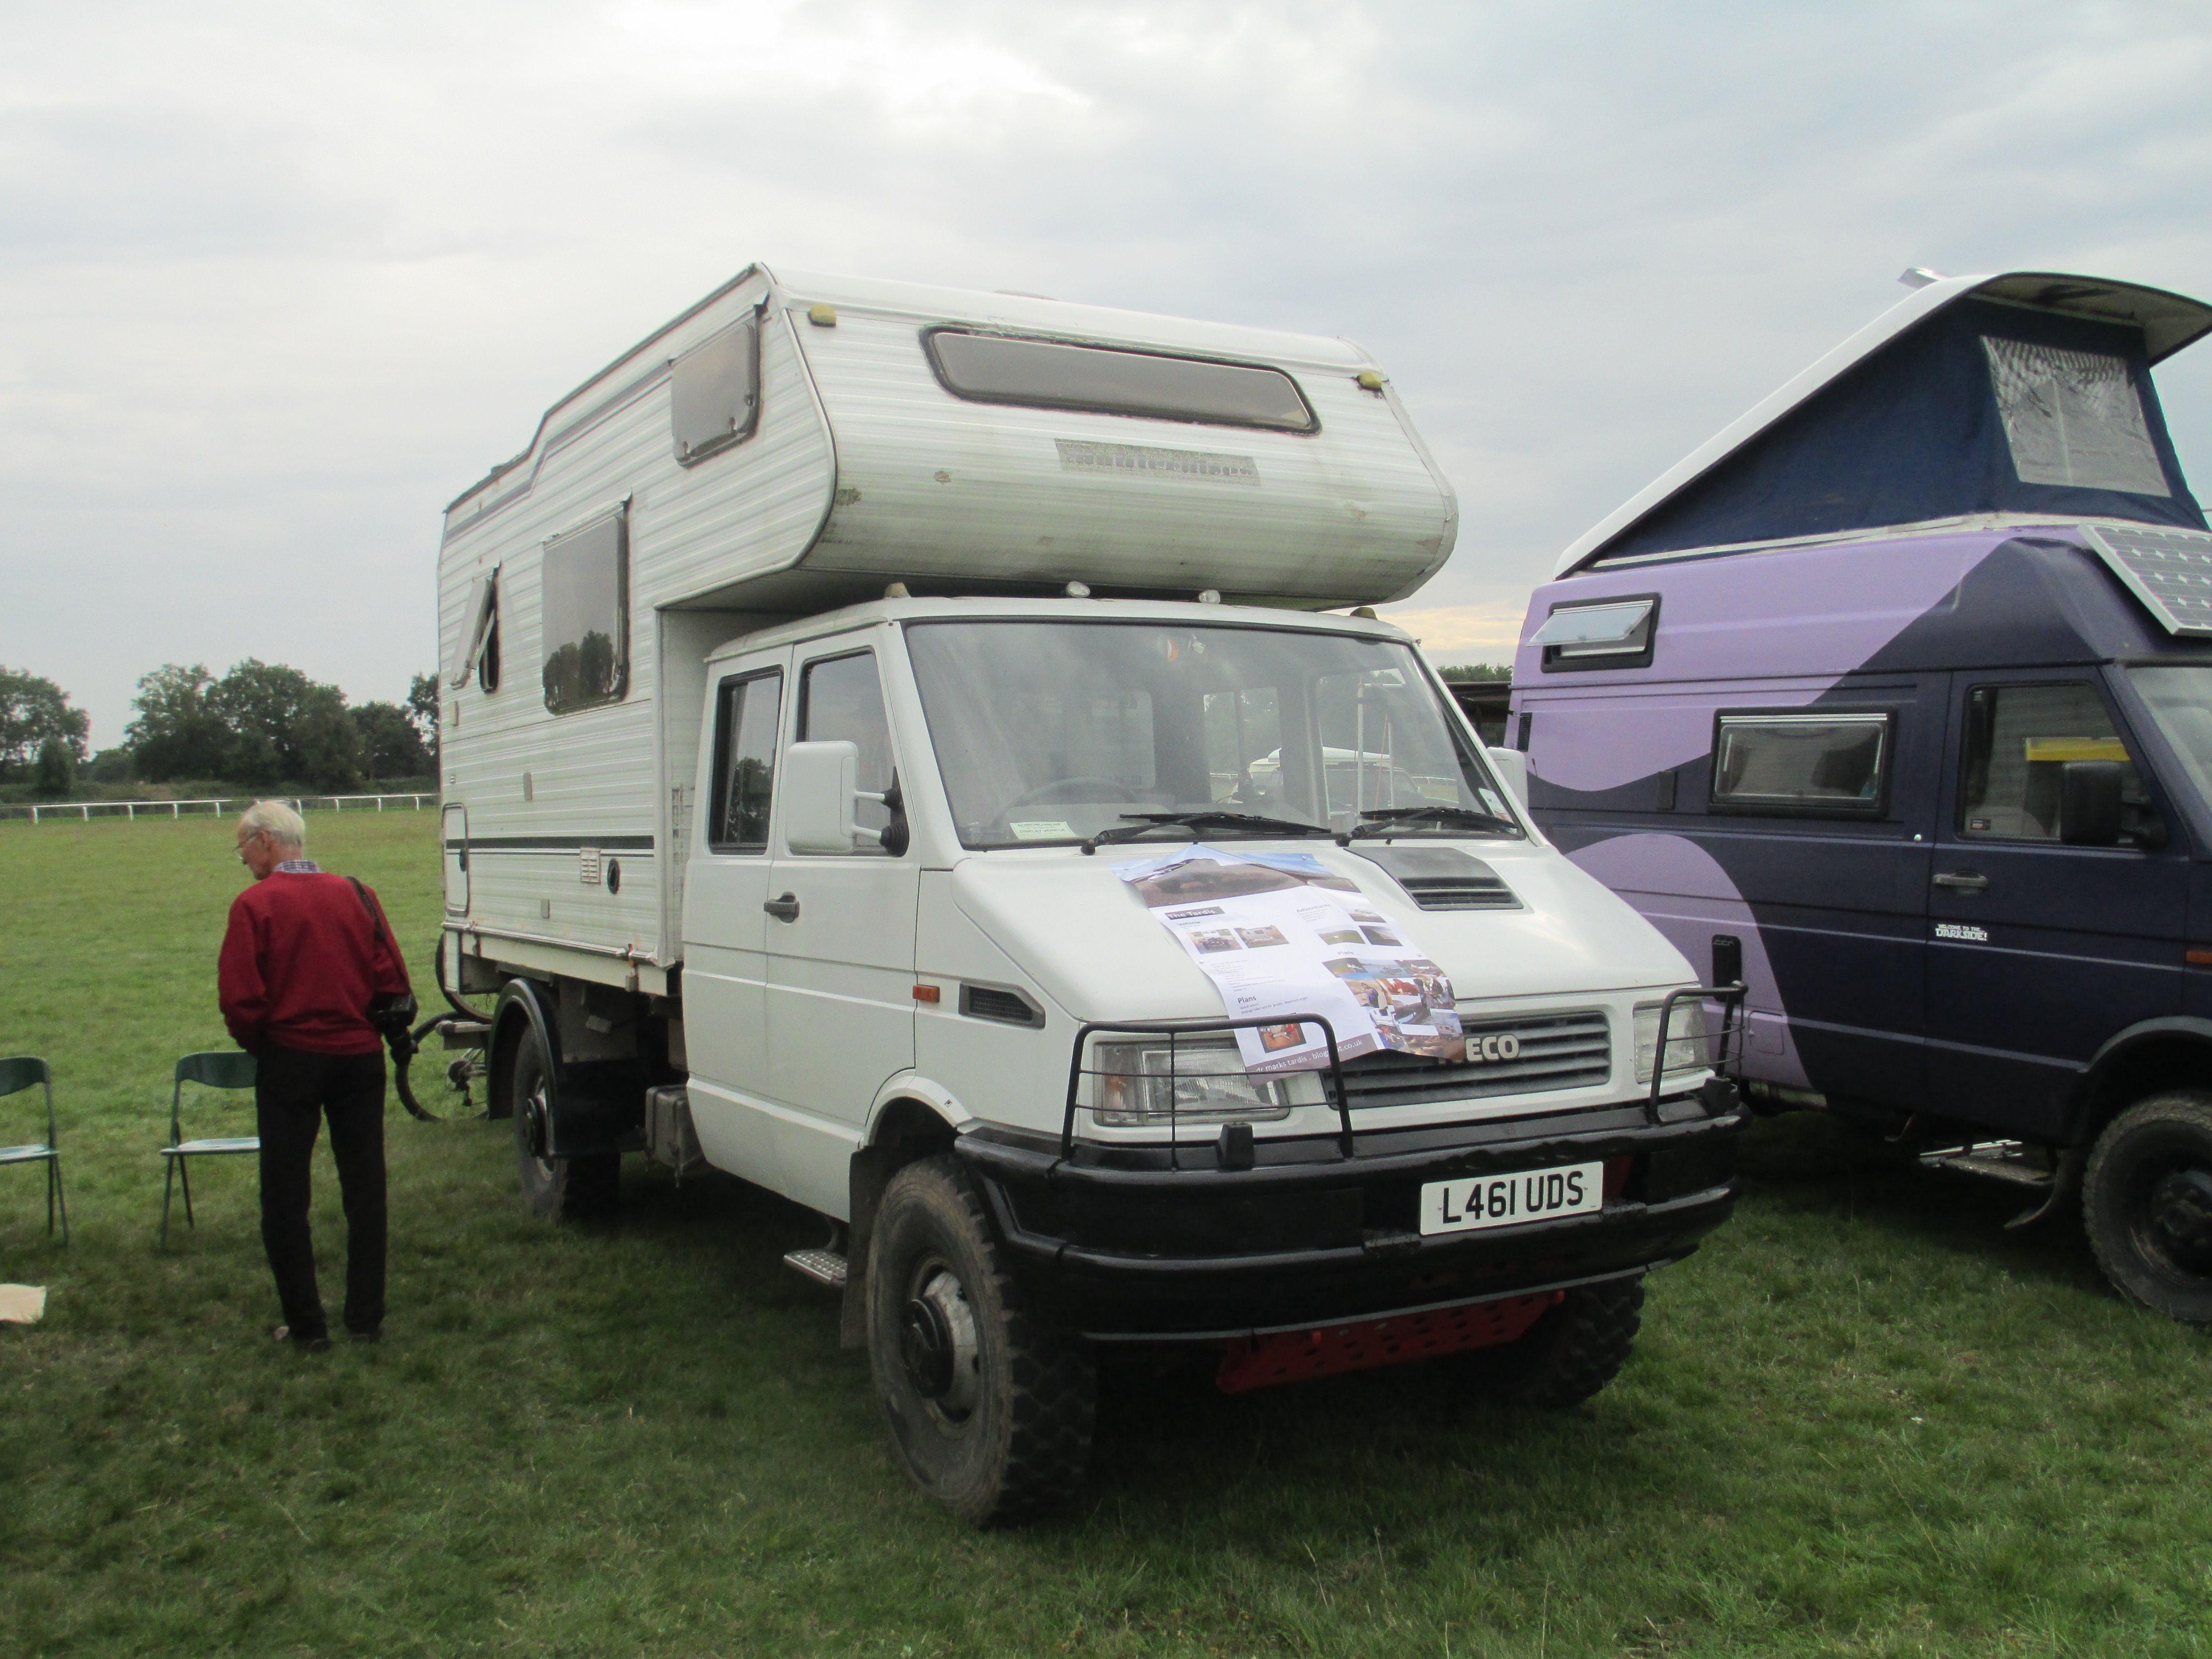 iveco doka 4x4 adventure camper overlanding pinterest adventure campers 4x4 and vehicle. Black Bedroom Furniture Sets. Home Design Ideas